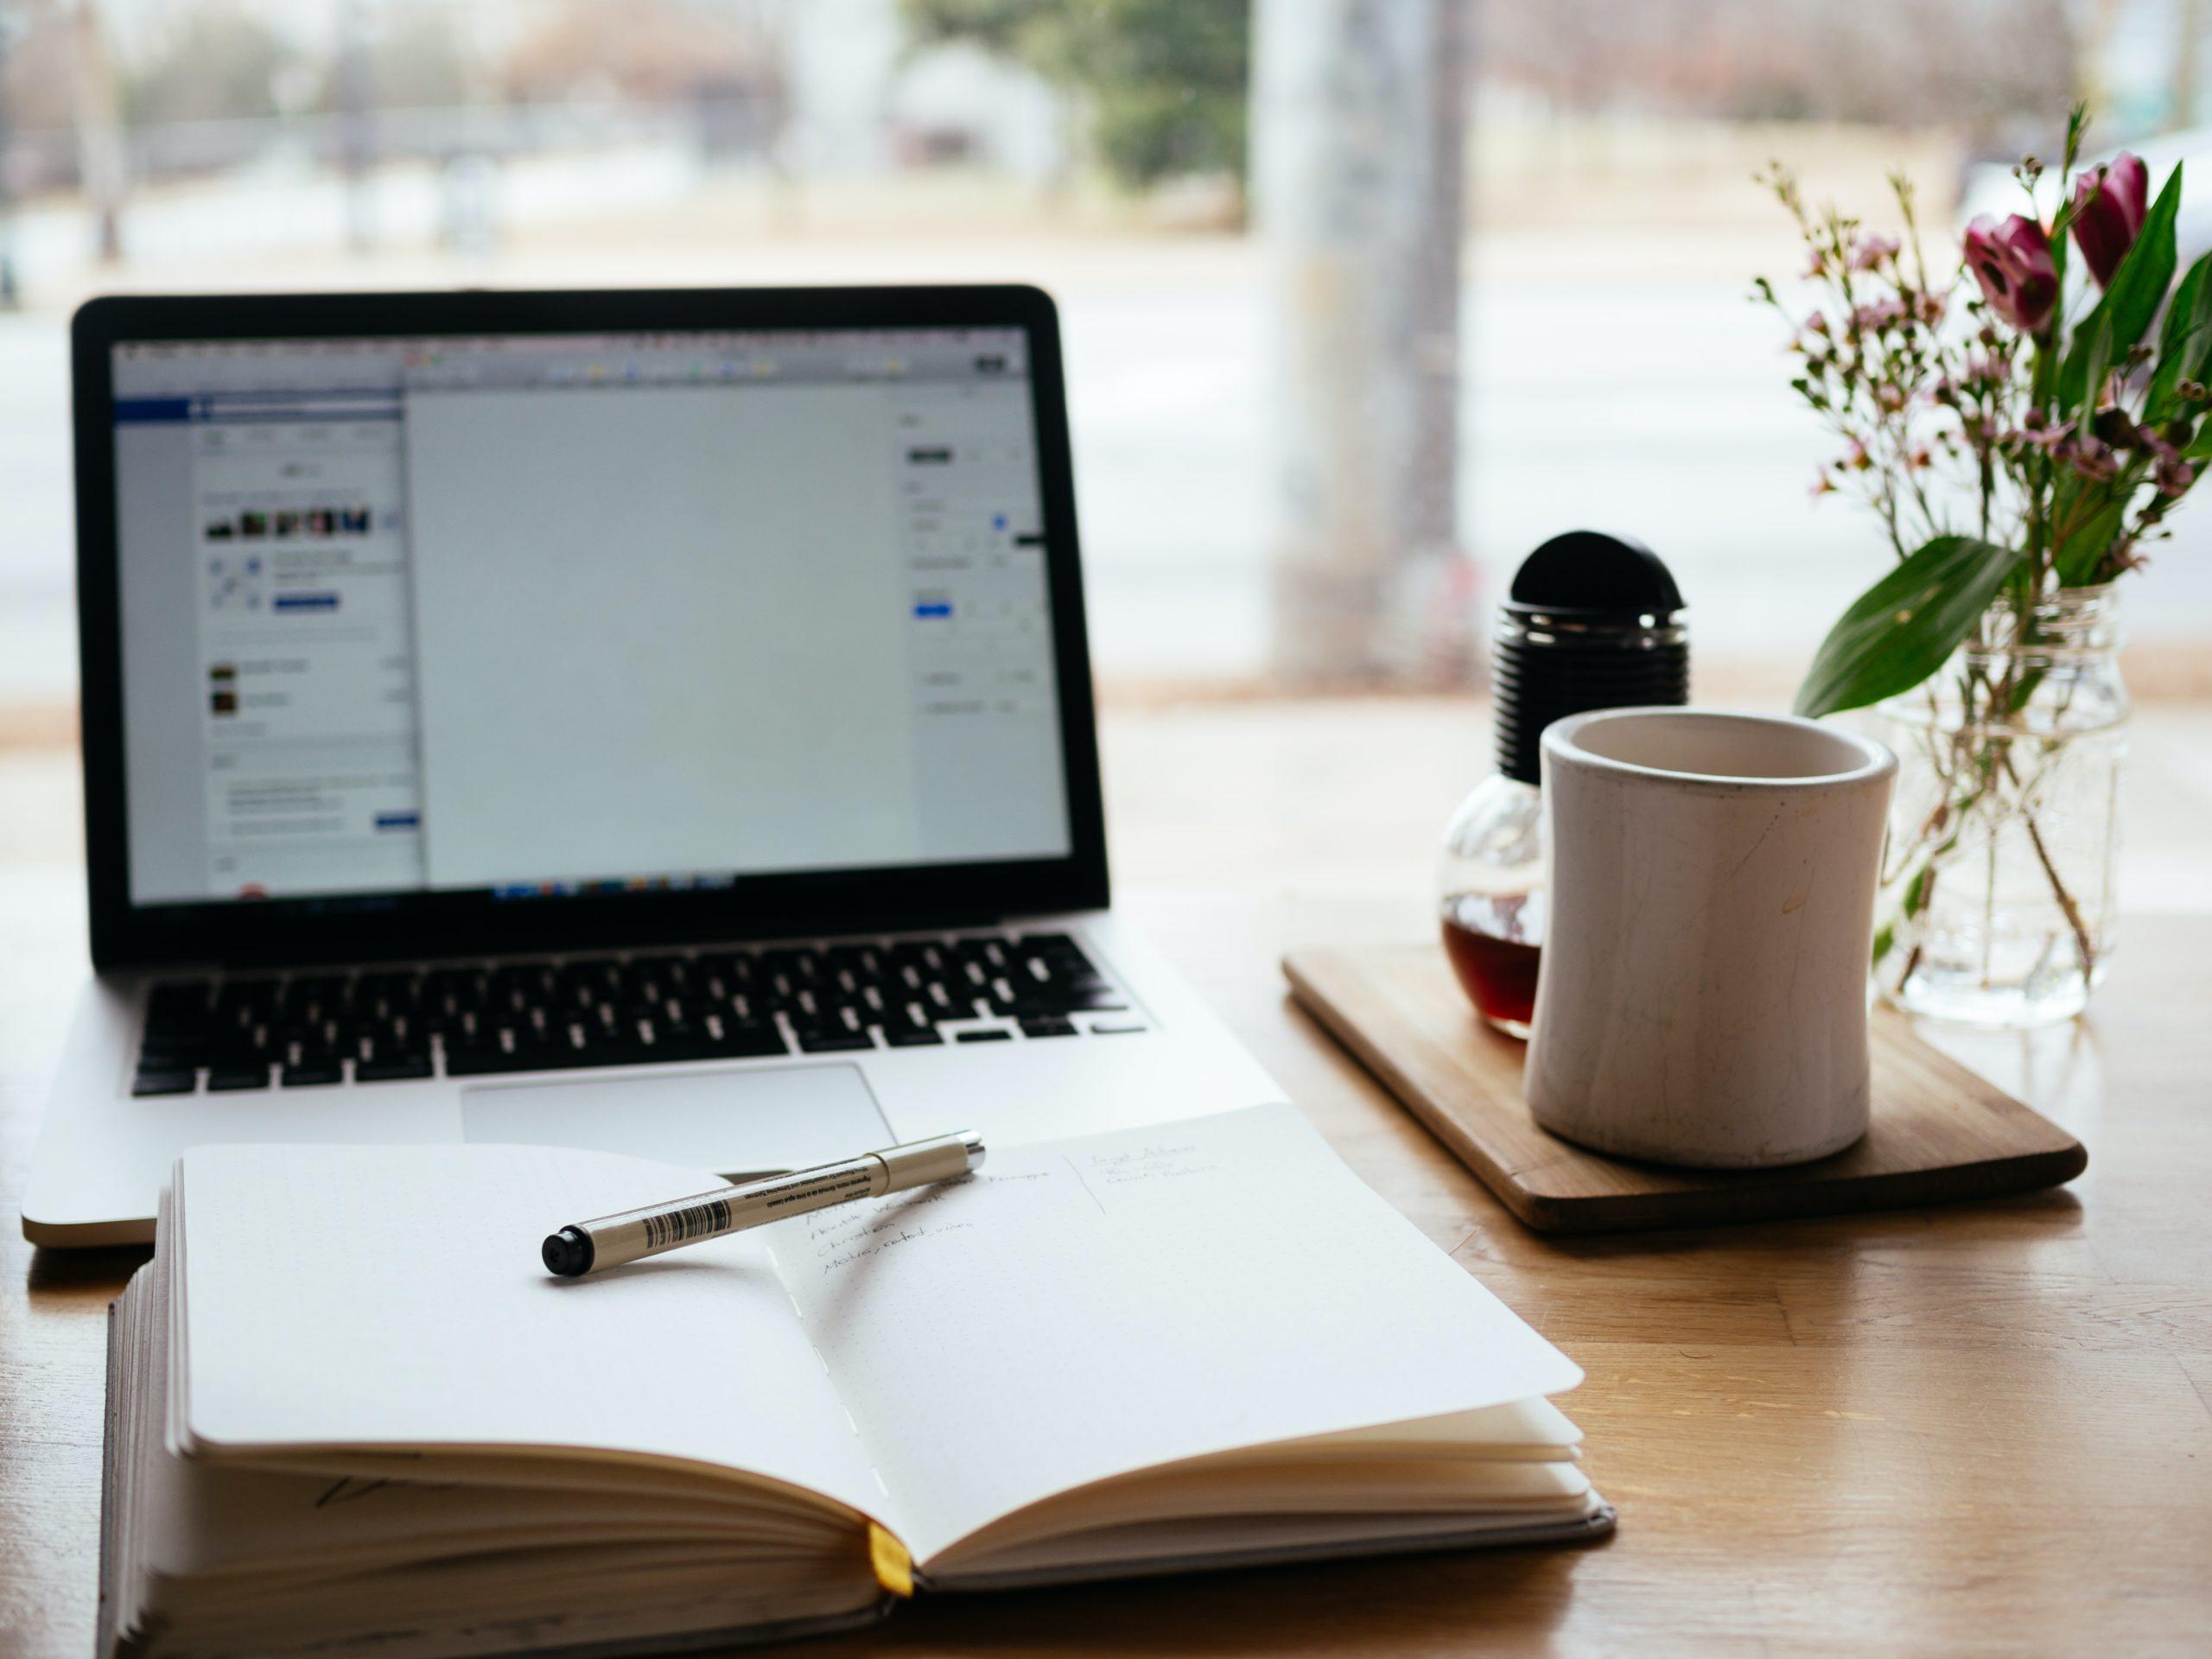 laptop, notebook and coffee mug